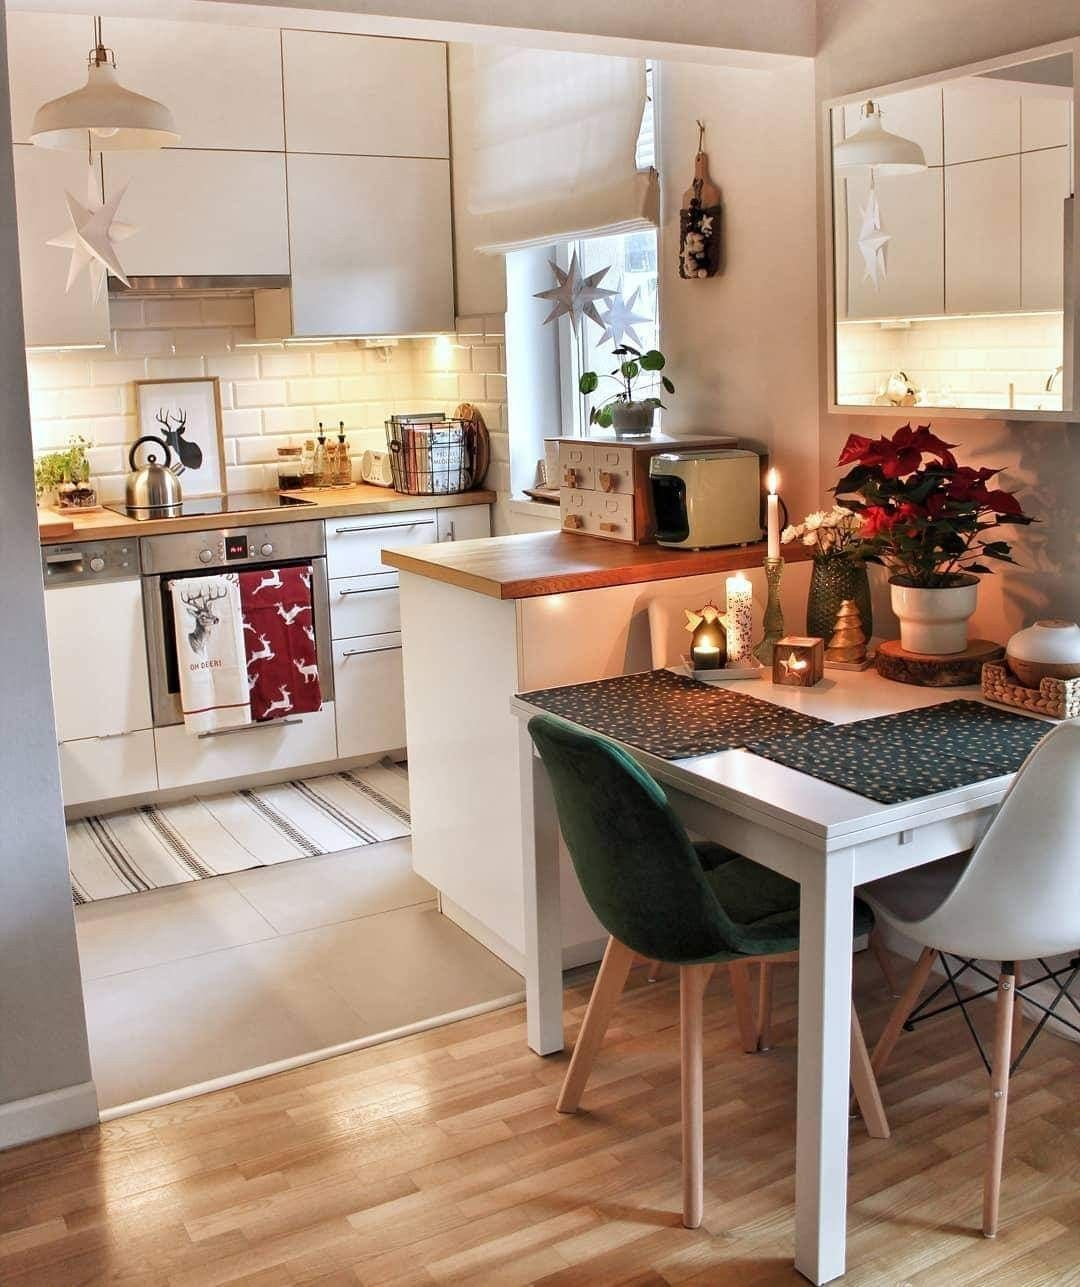 küchetisch  Diseño de cocina, Decoración de cocina, Diseño de